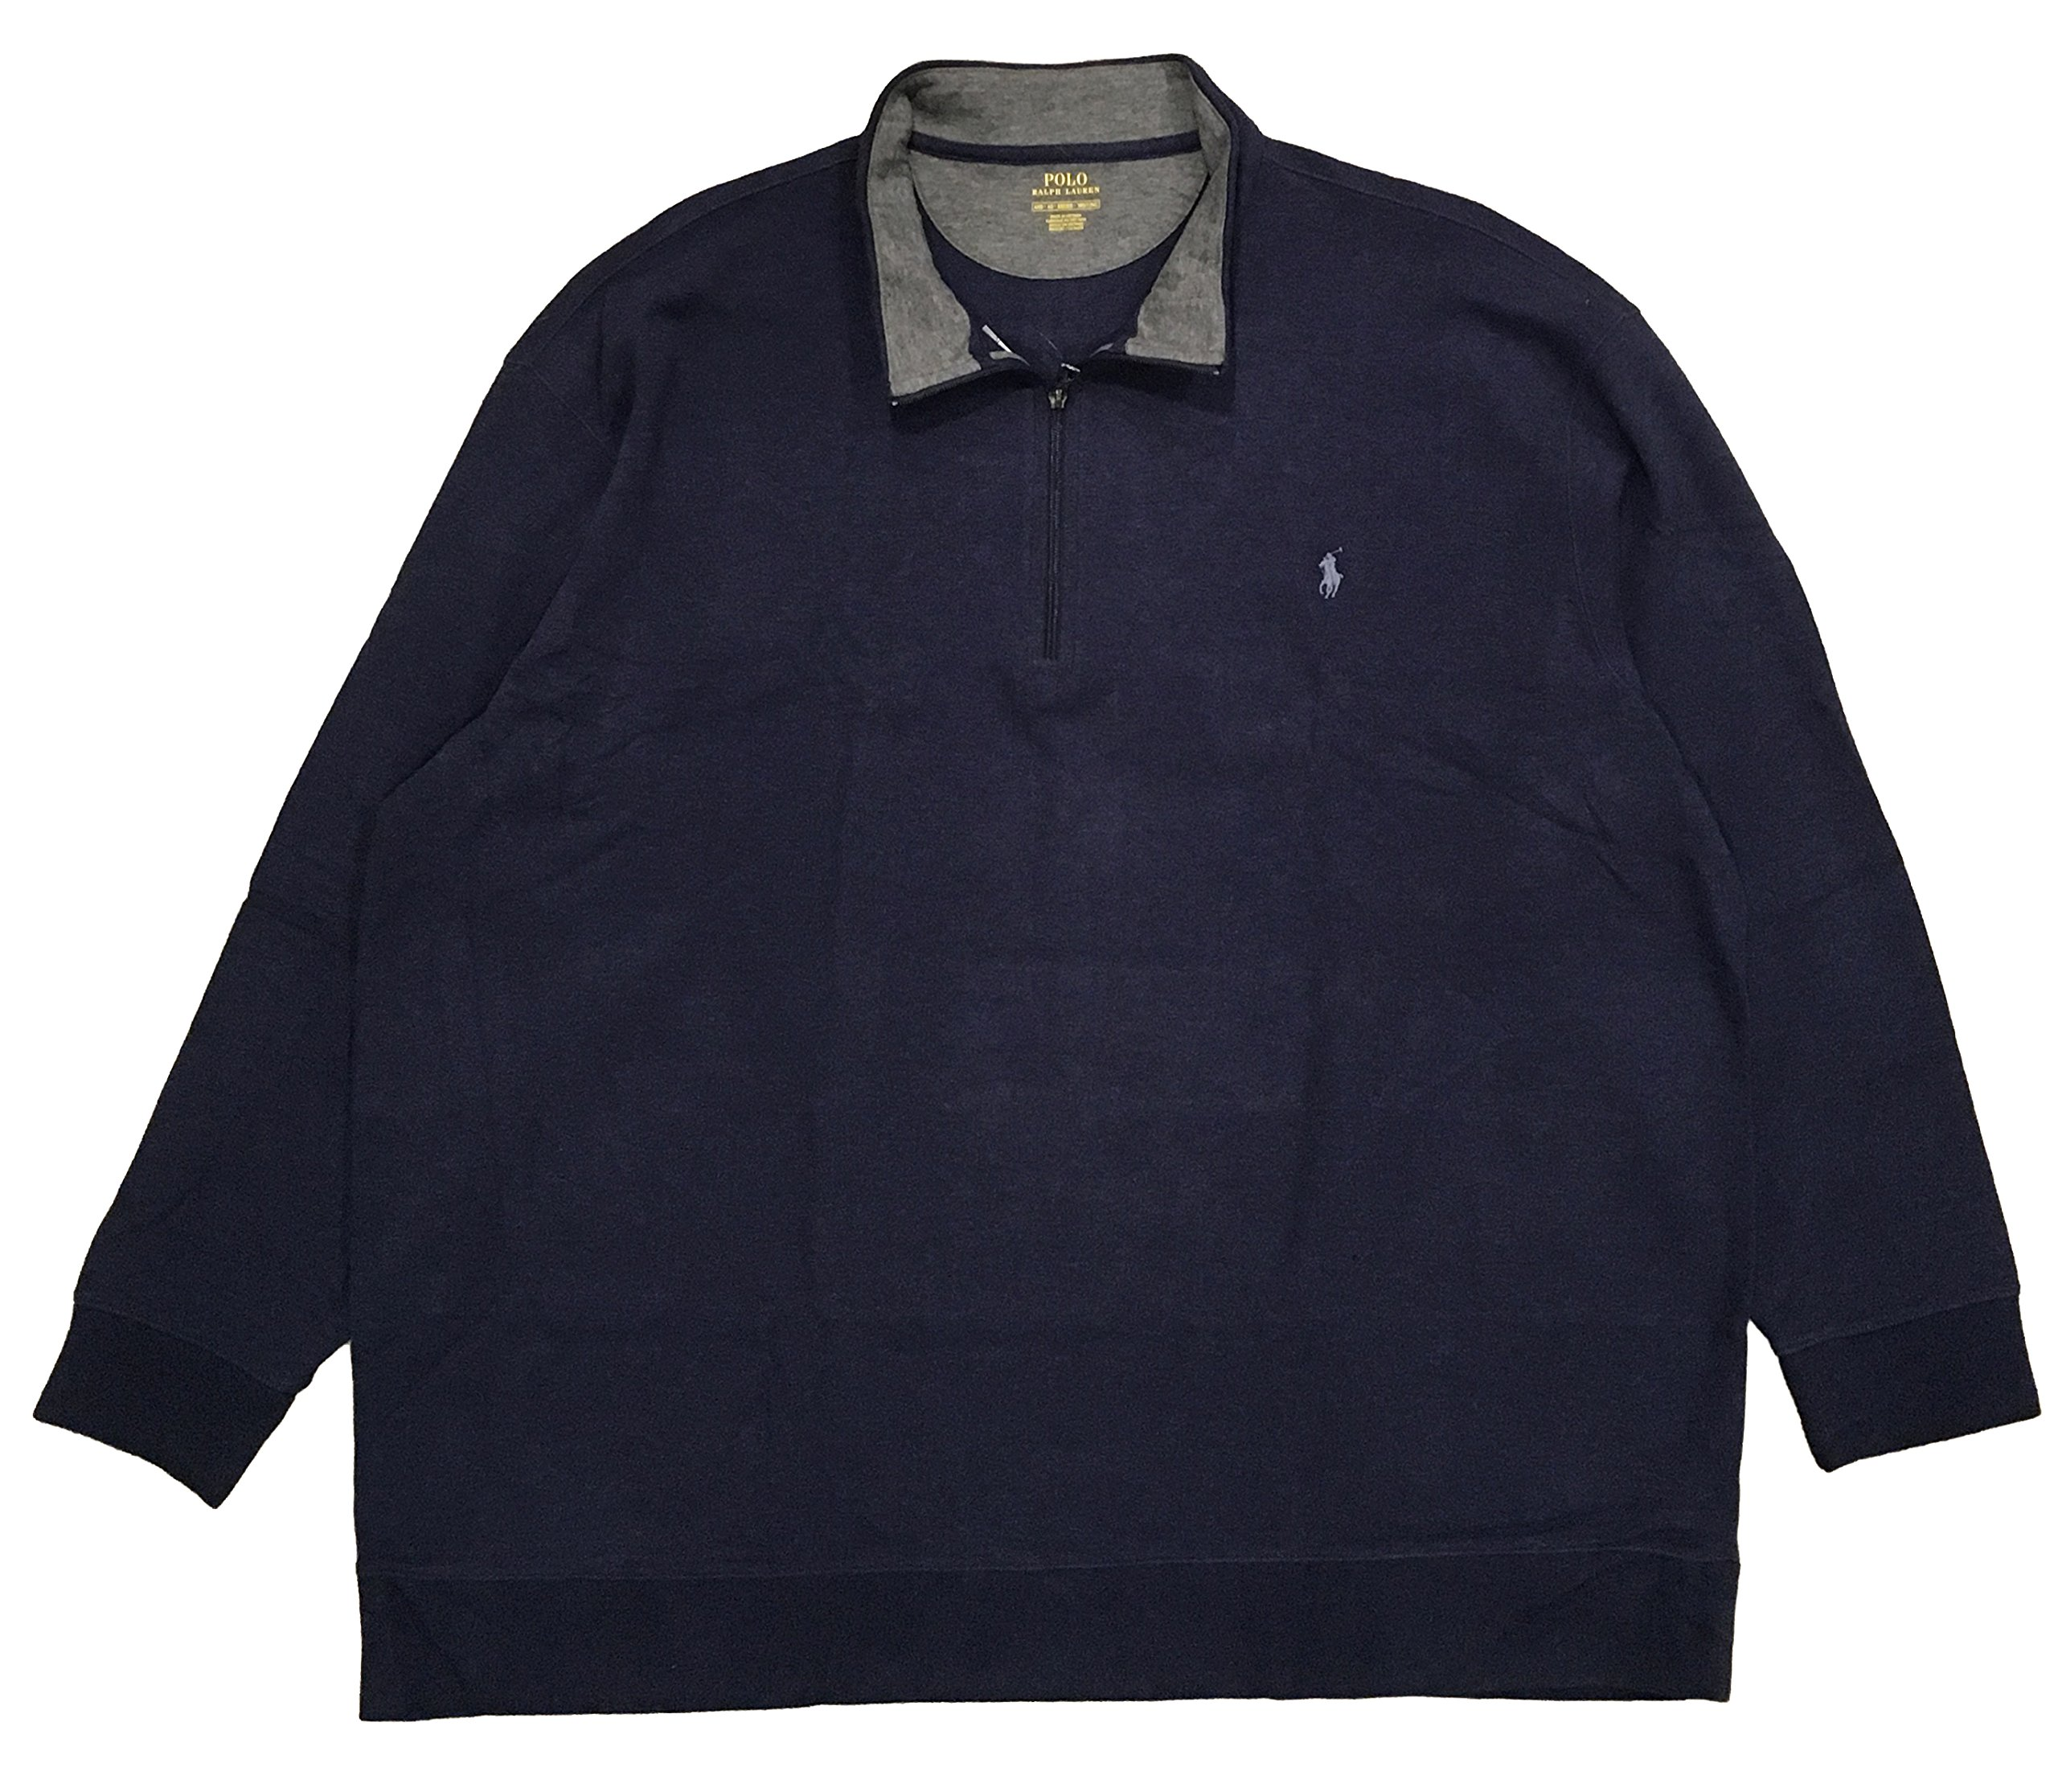 Polo Ralph Lauren Luxury Jersey Pullover (4X Big, Spring Navy)